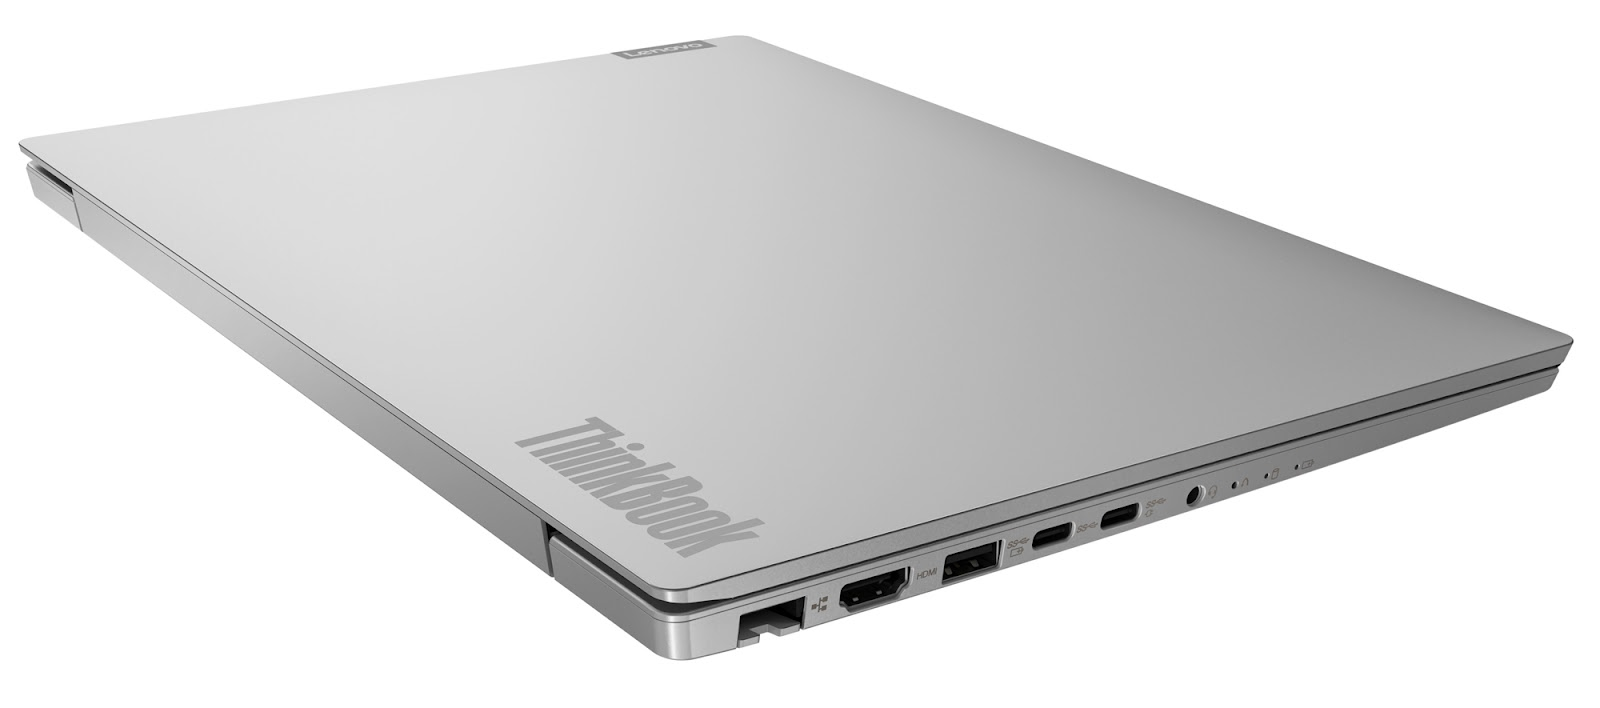 Фото 3. Ноутбук Lenovo ThinkBook 14 IIL (20SL00F6RU)